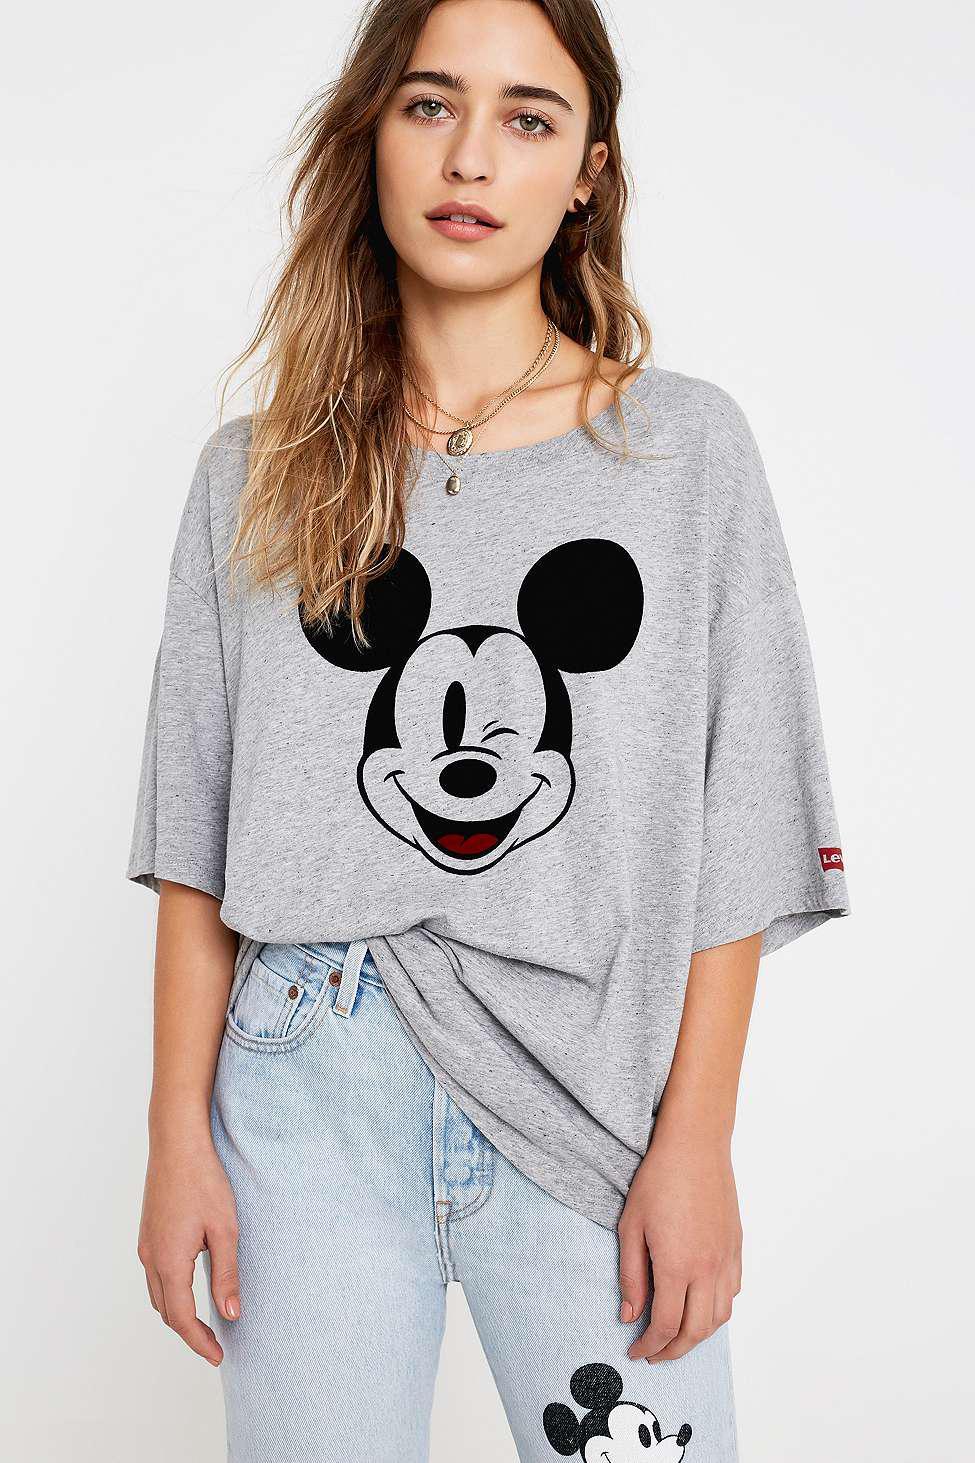 aa650f9c Levi's Mickey Mouse Slacker Grey T-shirt - Womens Xs/s in Gray - Lyst